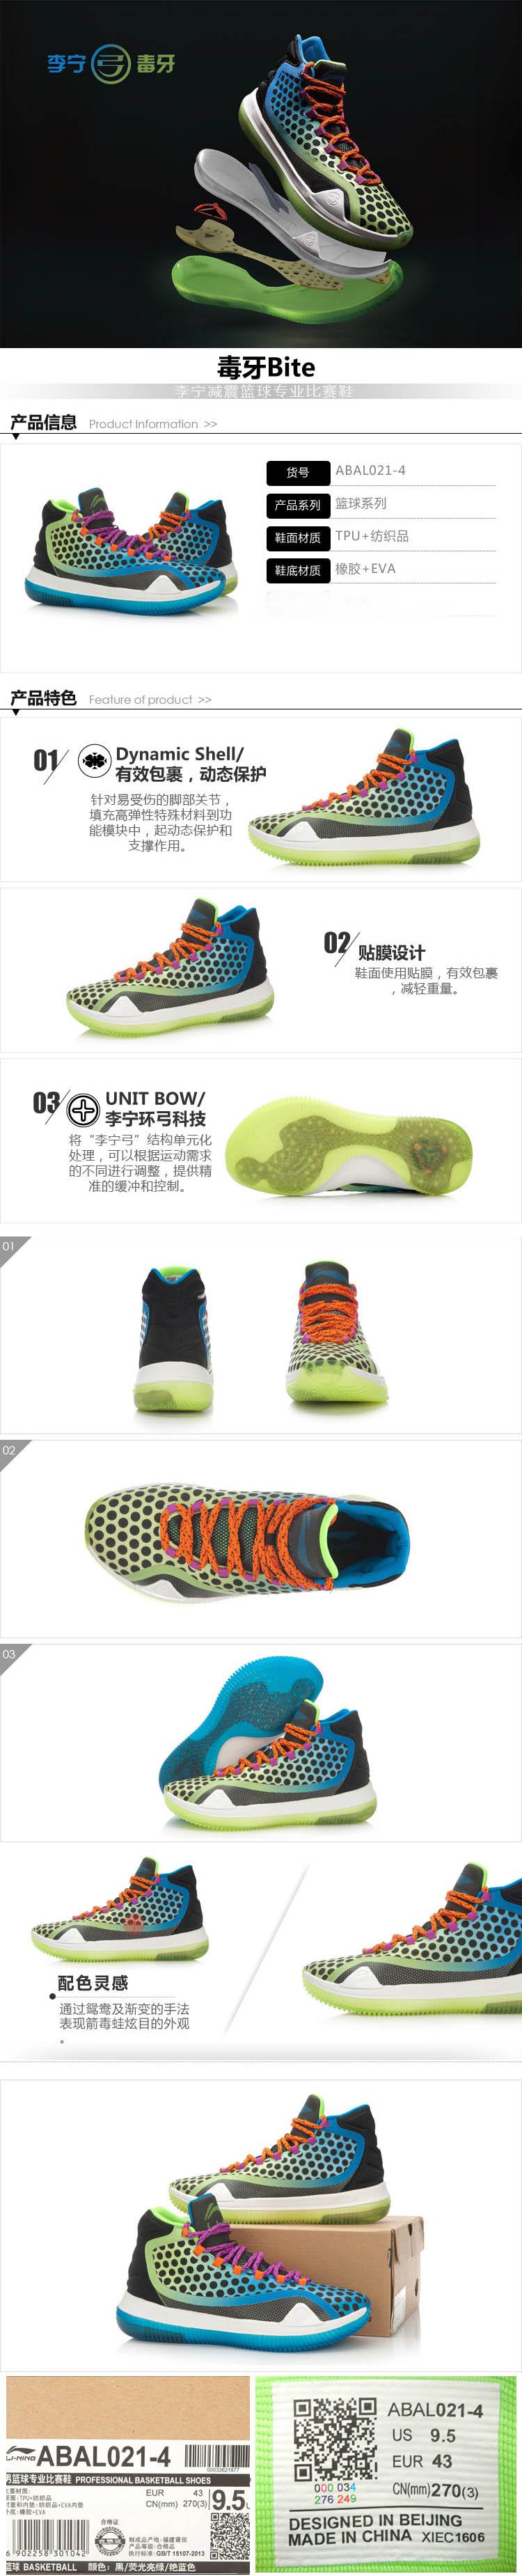 Li-Ning Bow Bite Men's High Top Professional Basketball Shoes - Black/Green/ Blue